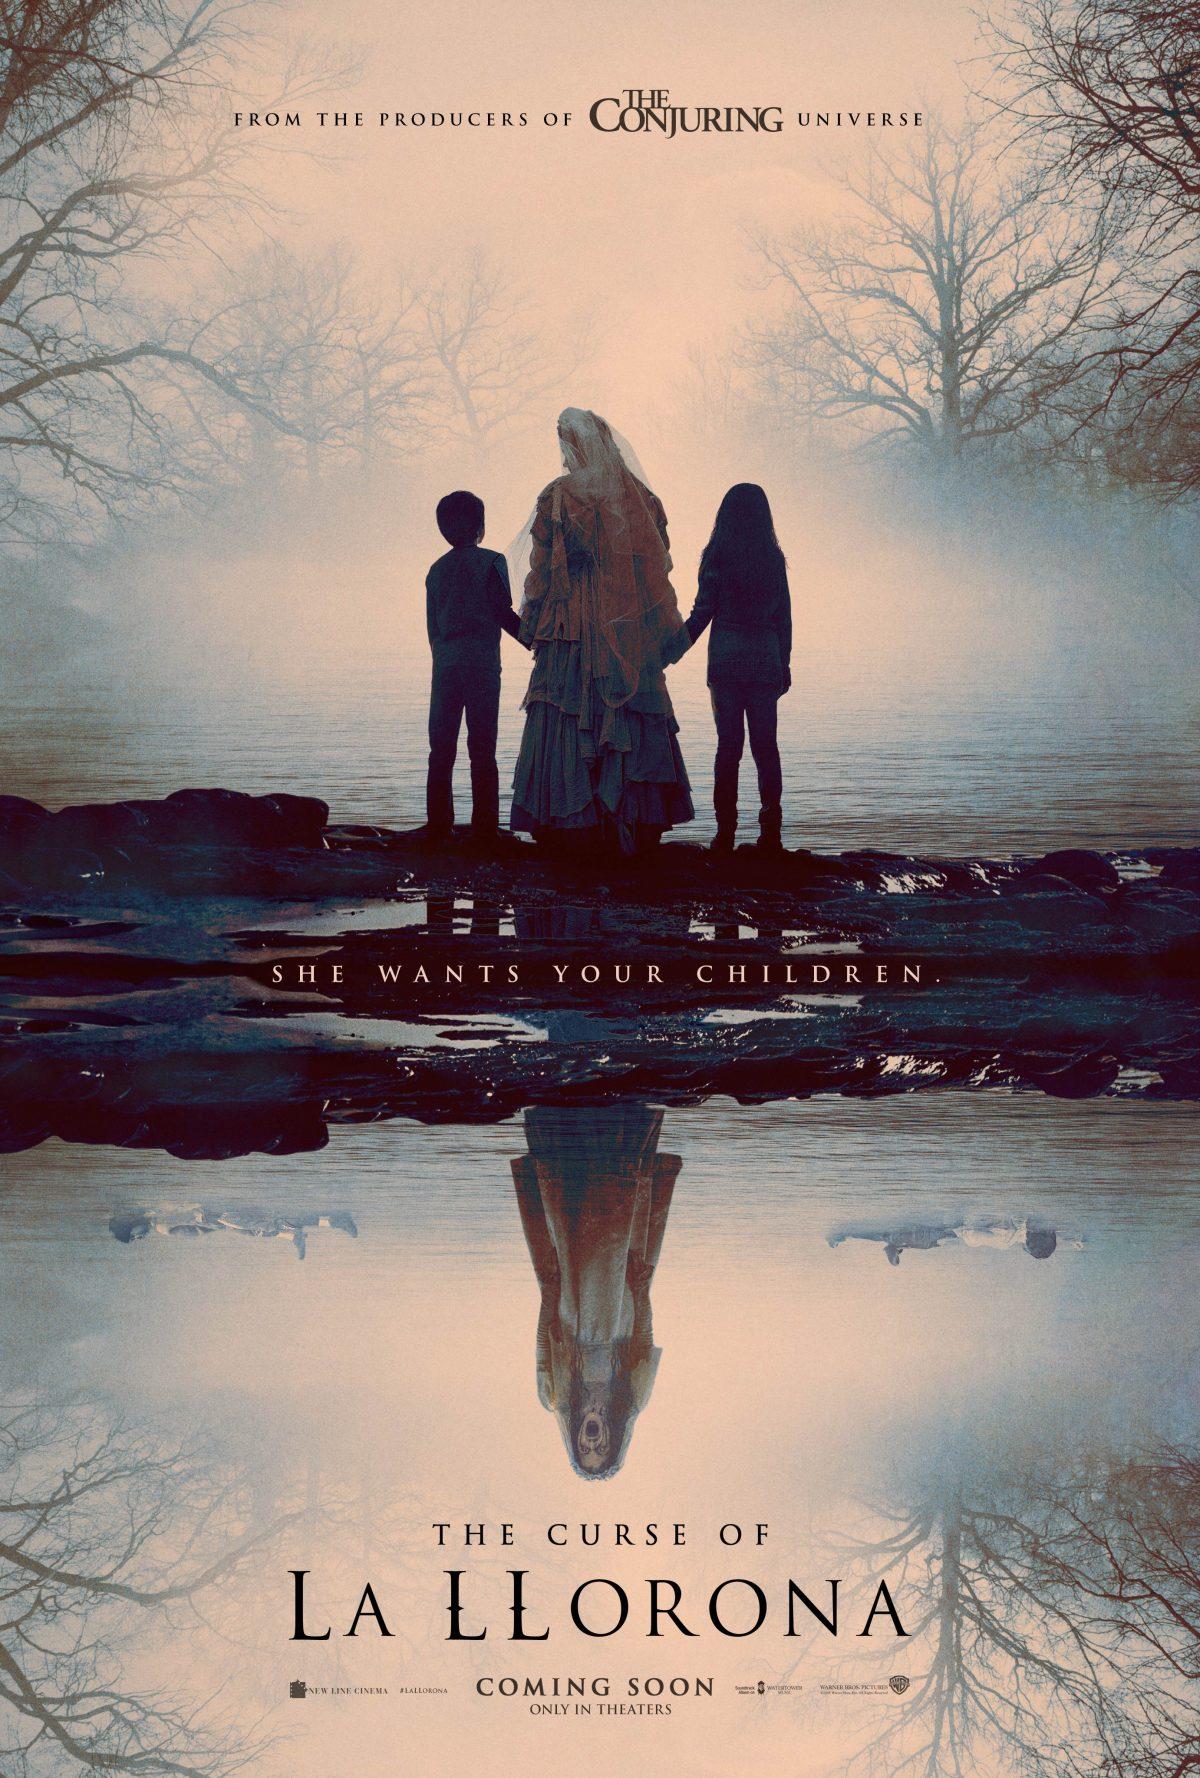 The Curse of La Llorona – New Trailer and Poster Announced